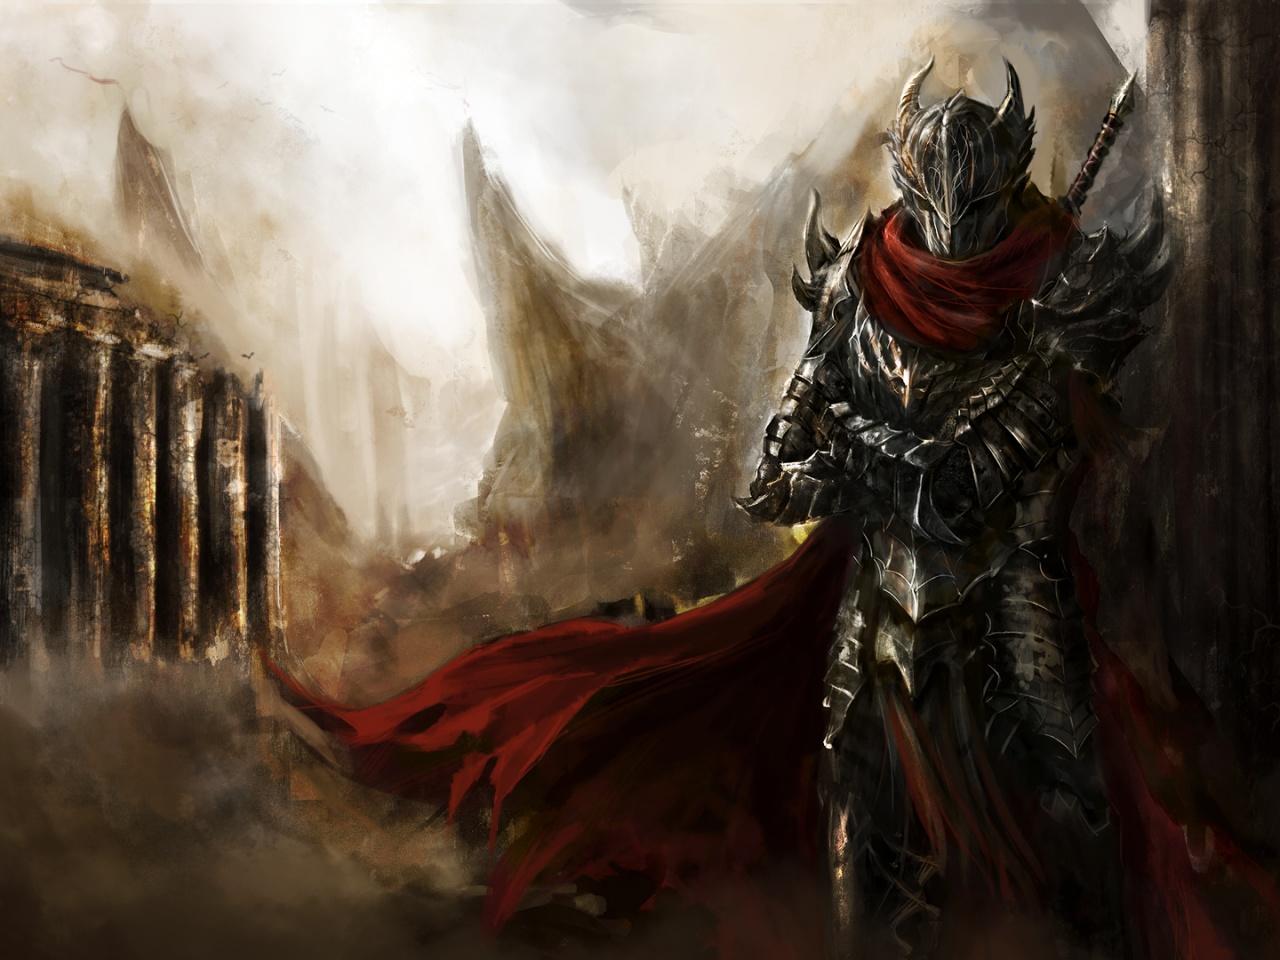 Dark warrior artwork Wallpaper in 1280x960 Normal